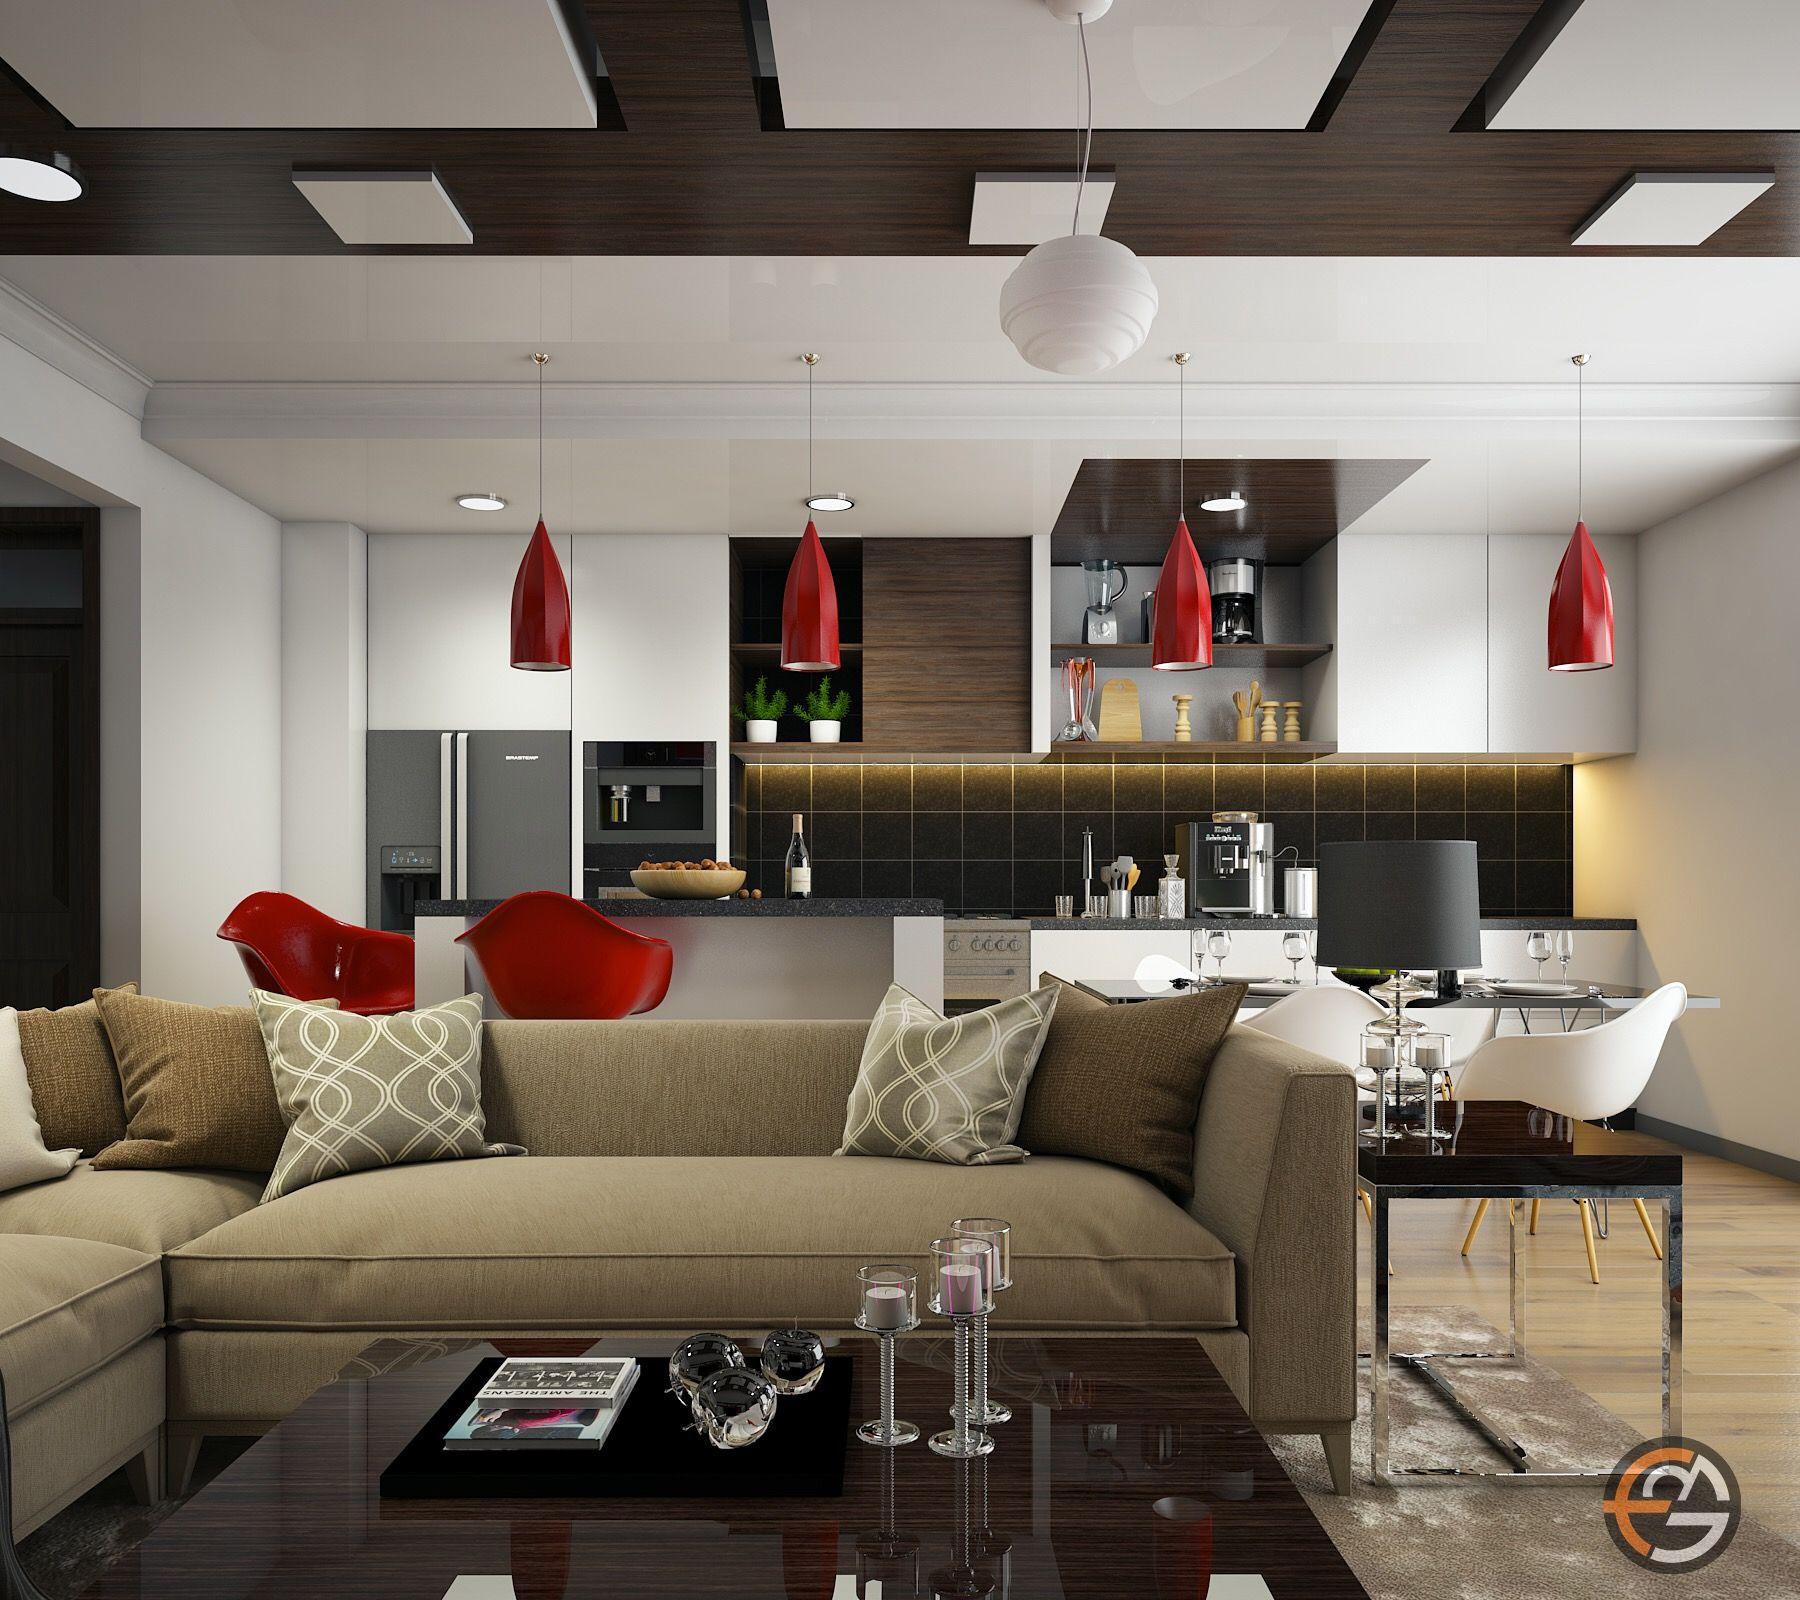 Apartment interior design by egmdesigns egmdesigns